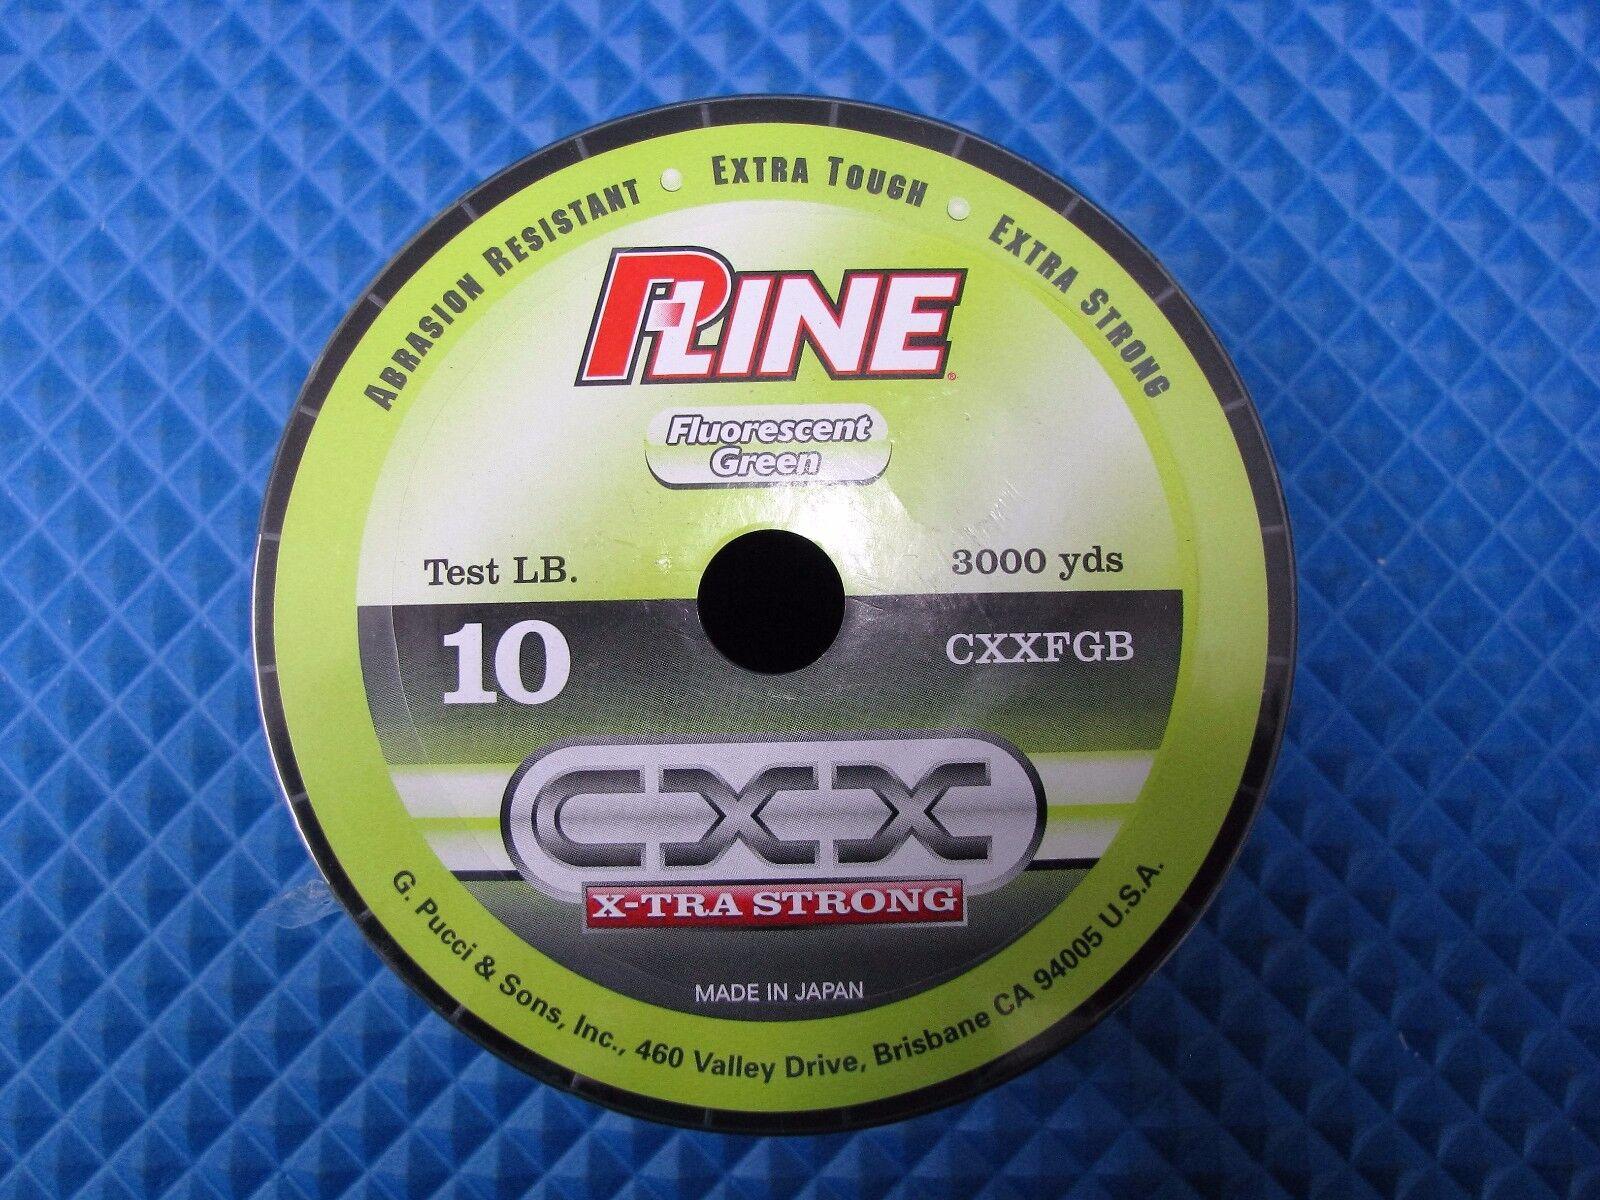 P-Line 10lb Fluorescent Grün Fishing Line 3000 yd Löffel CXXFGB-10